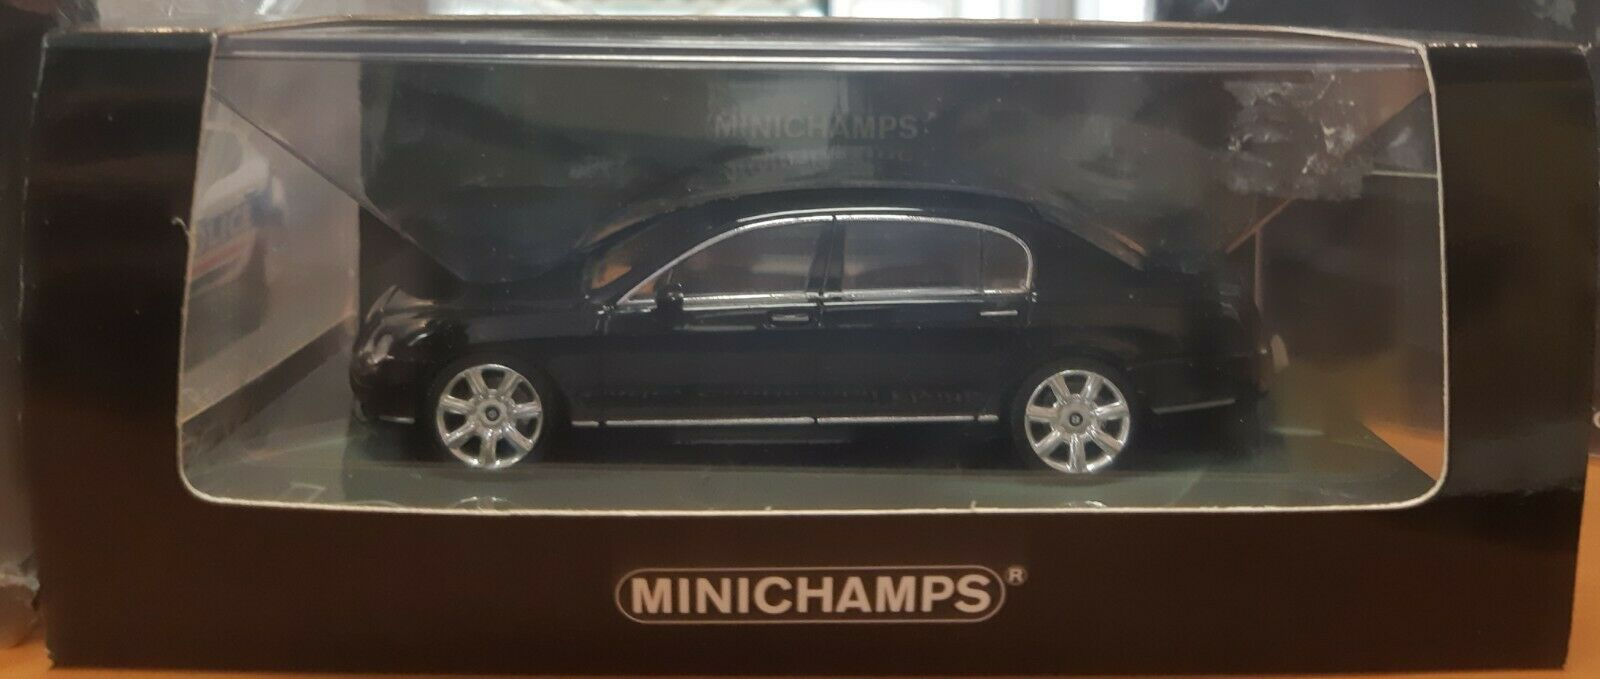 Minichamps Bentley Continental Flying Spur 1 43